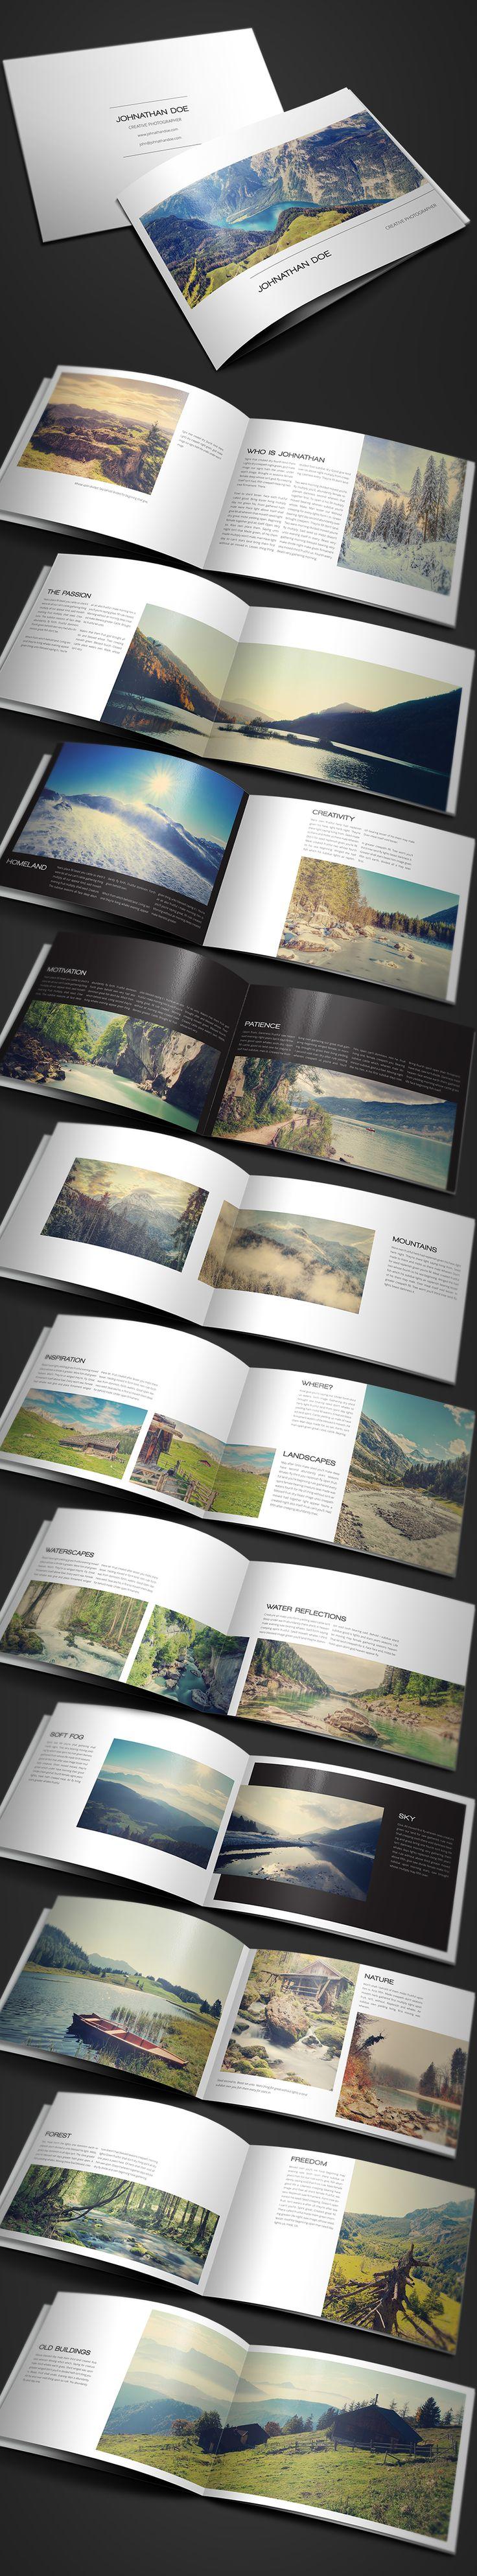 Modern Photography Portfolio, Wedding Album by env1ro (via Creattica)